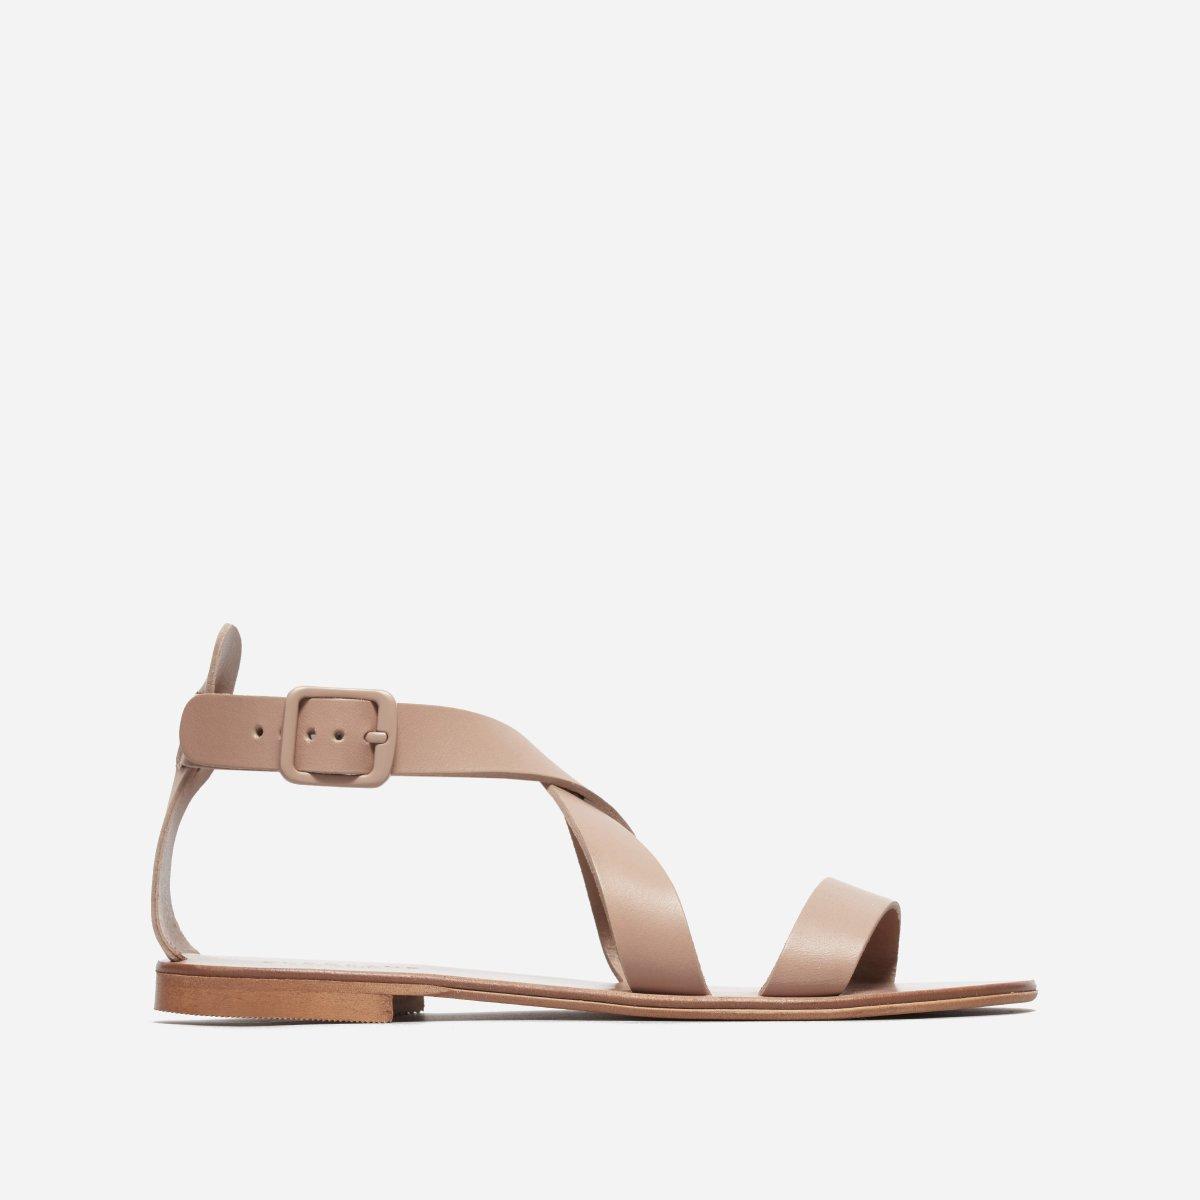 The Modern Wrap Sandal by Everlane